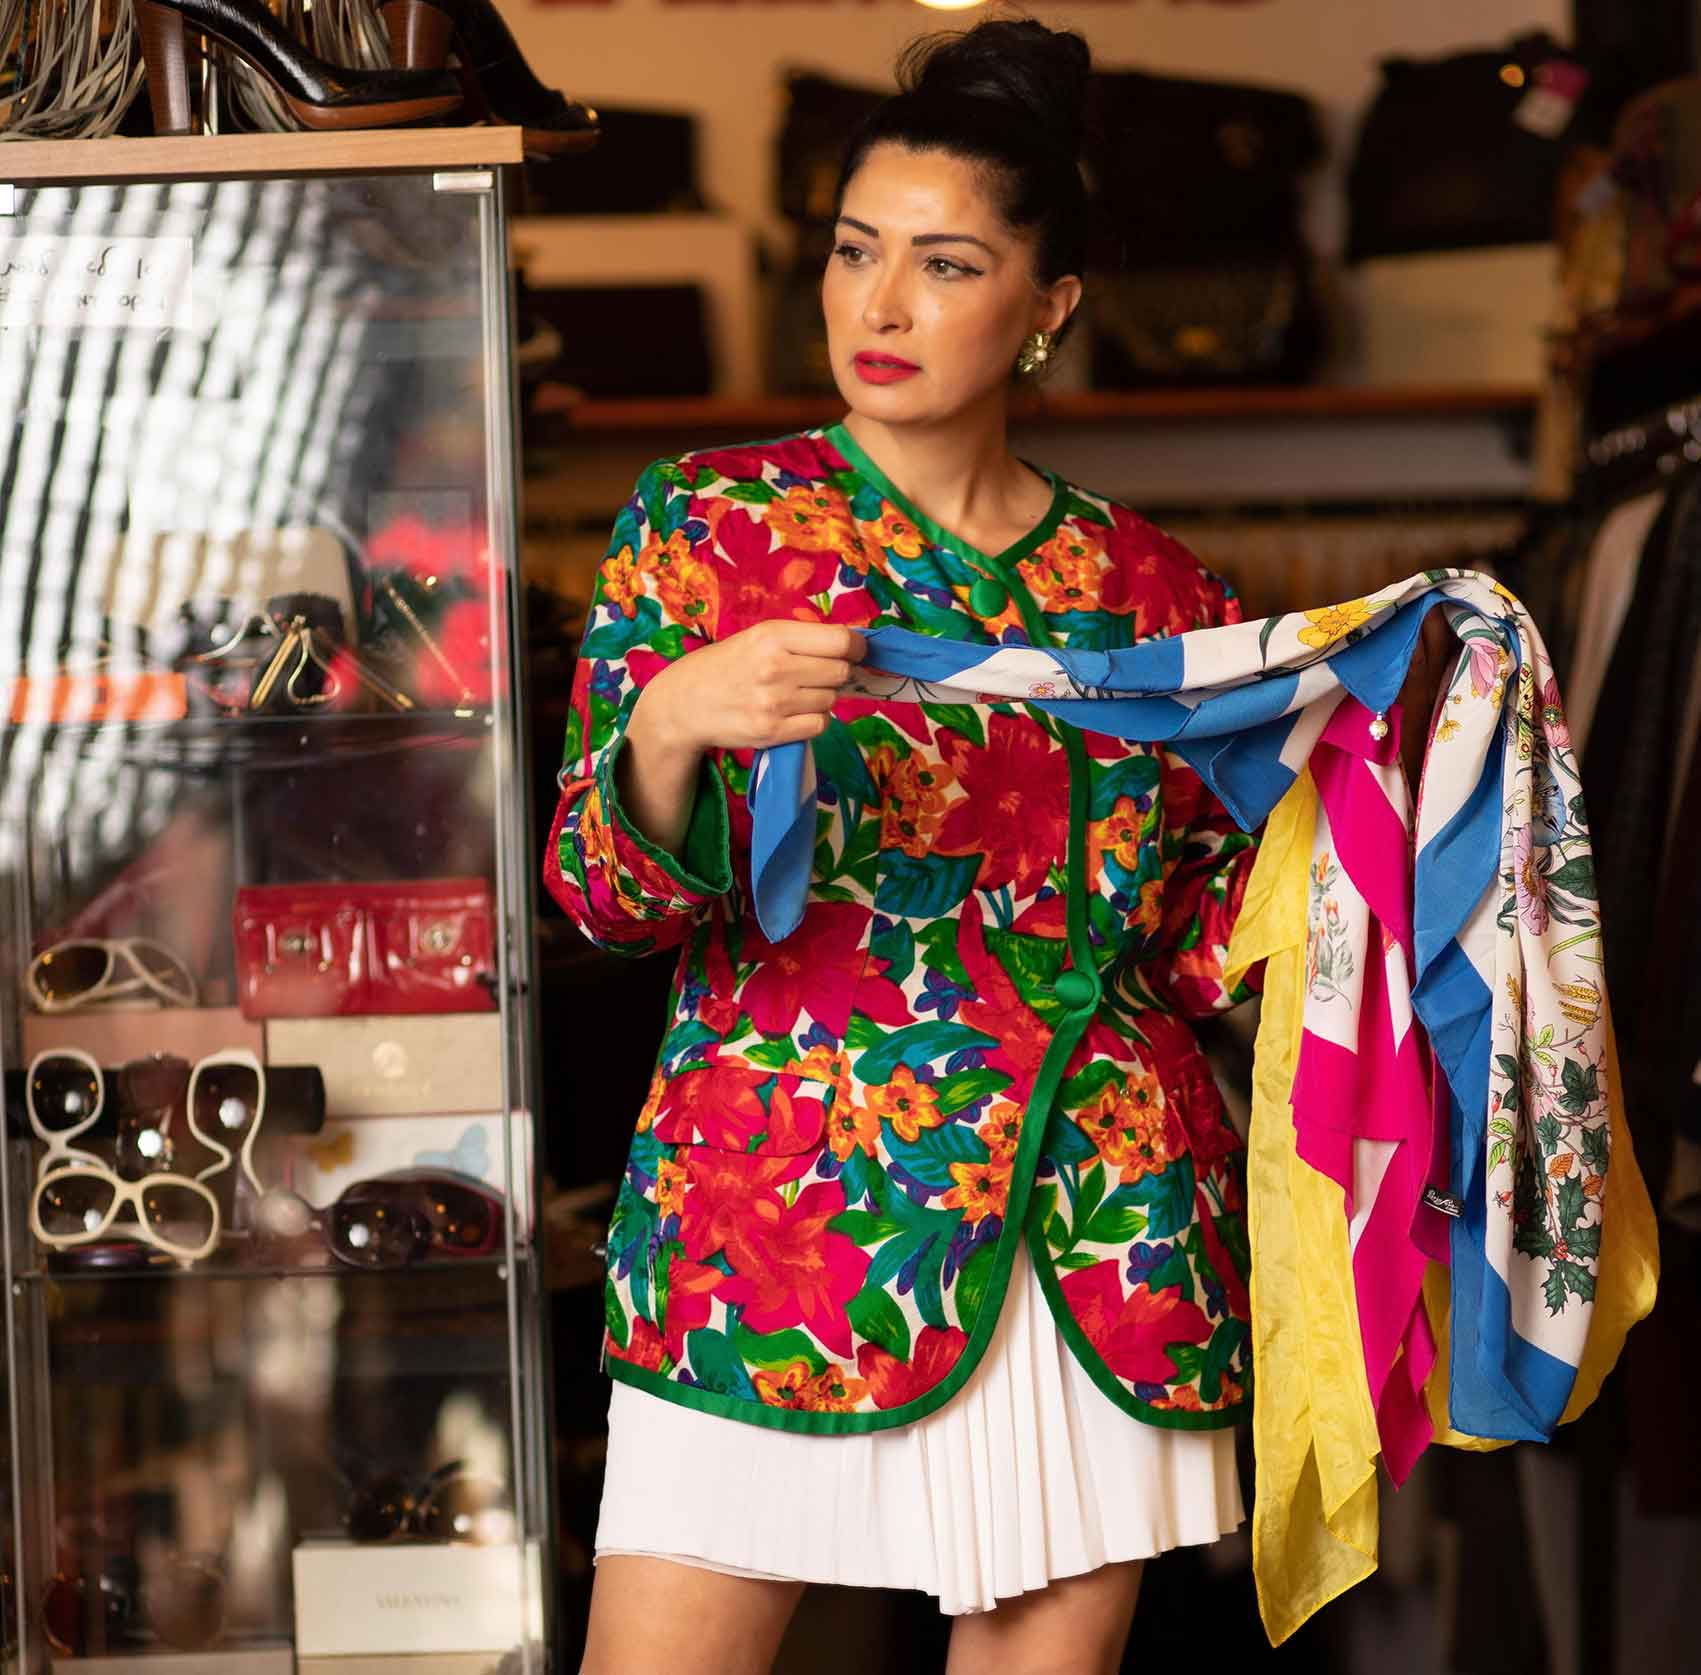 LOVE-ME-TWO-TIMES-כתבות-אופנה